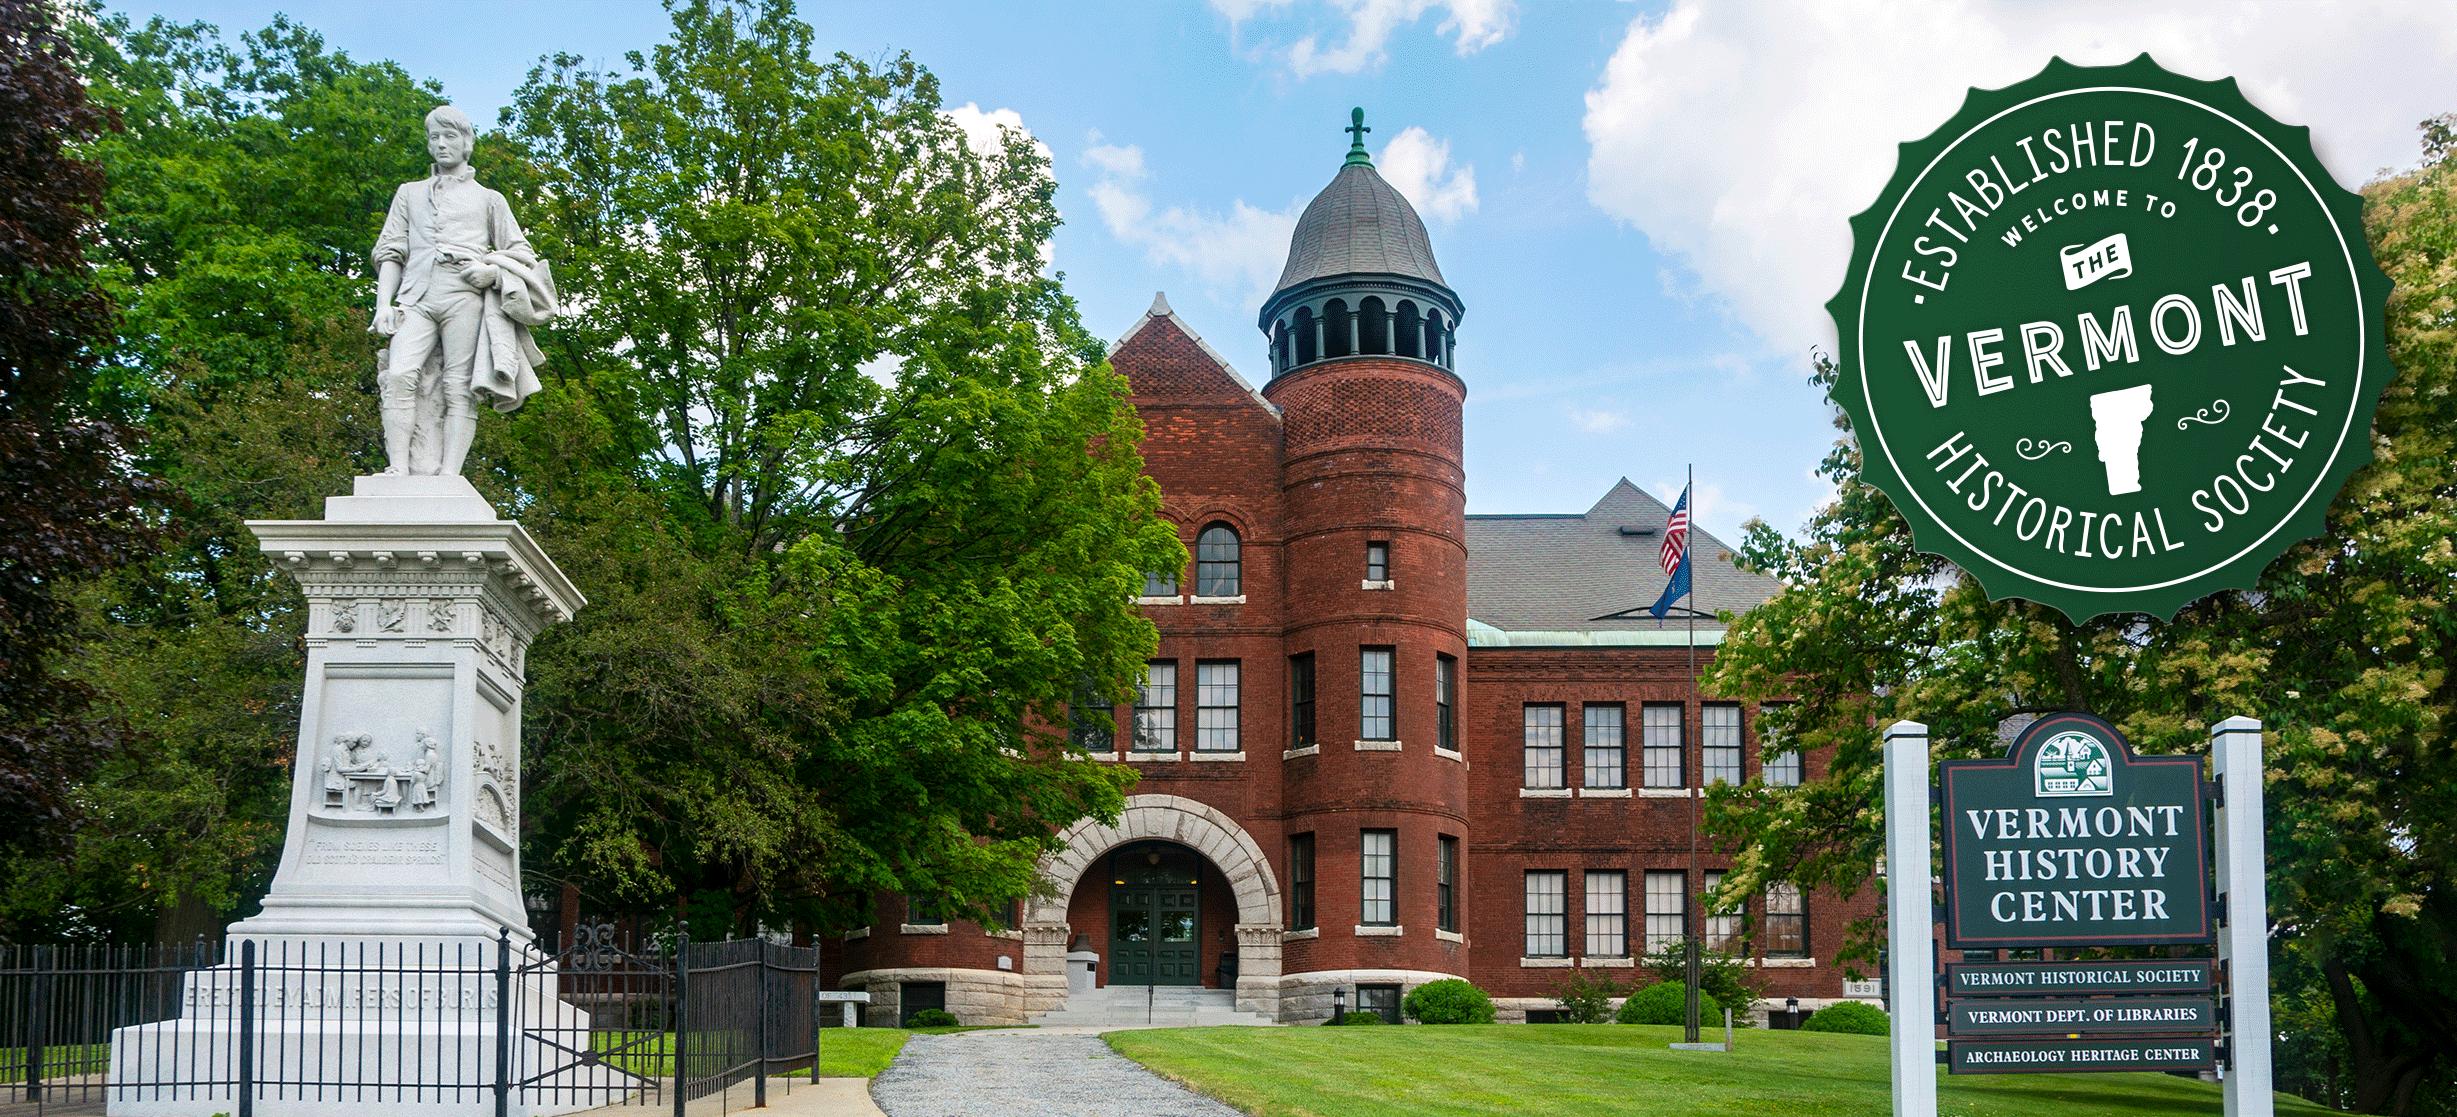 Vermont Historical Society Vermont Historical Society